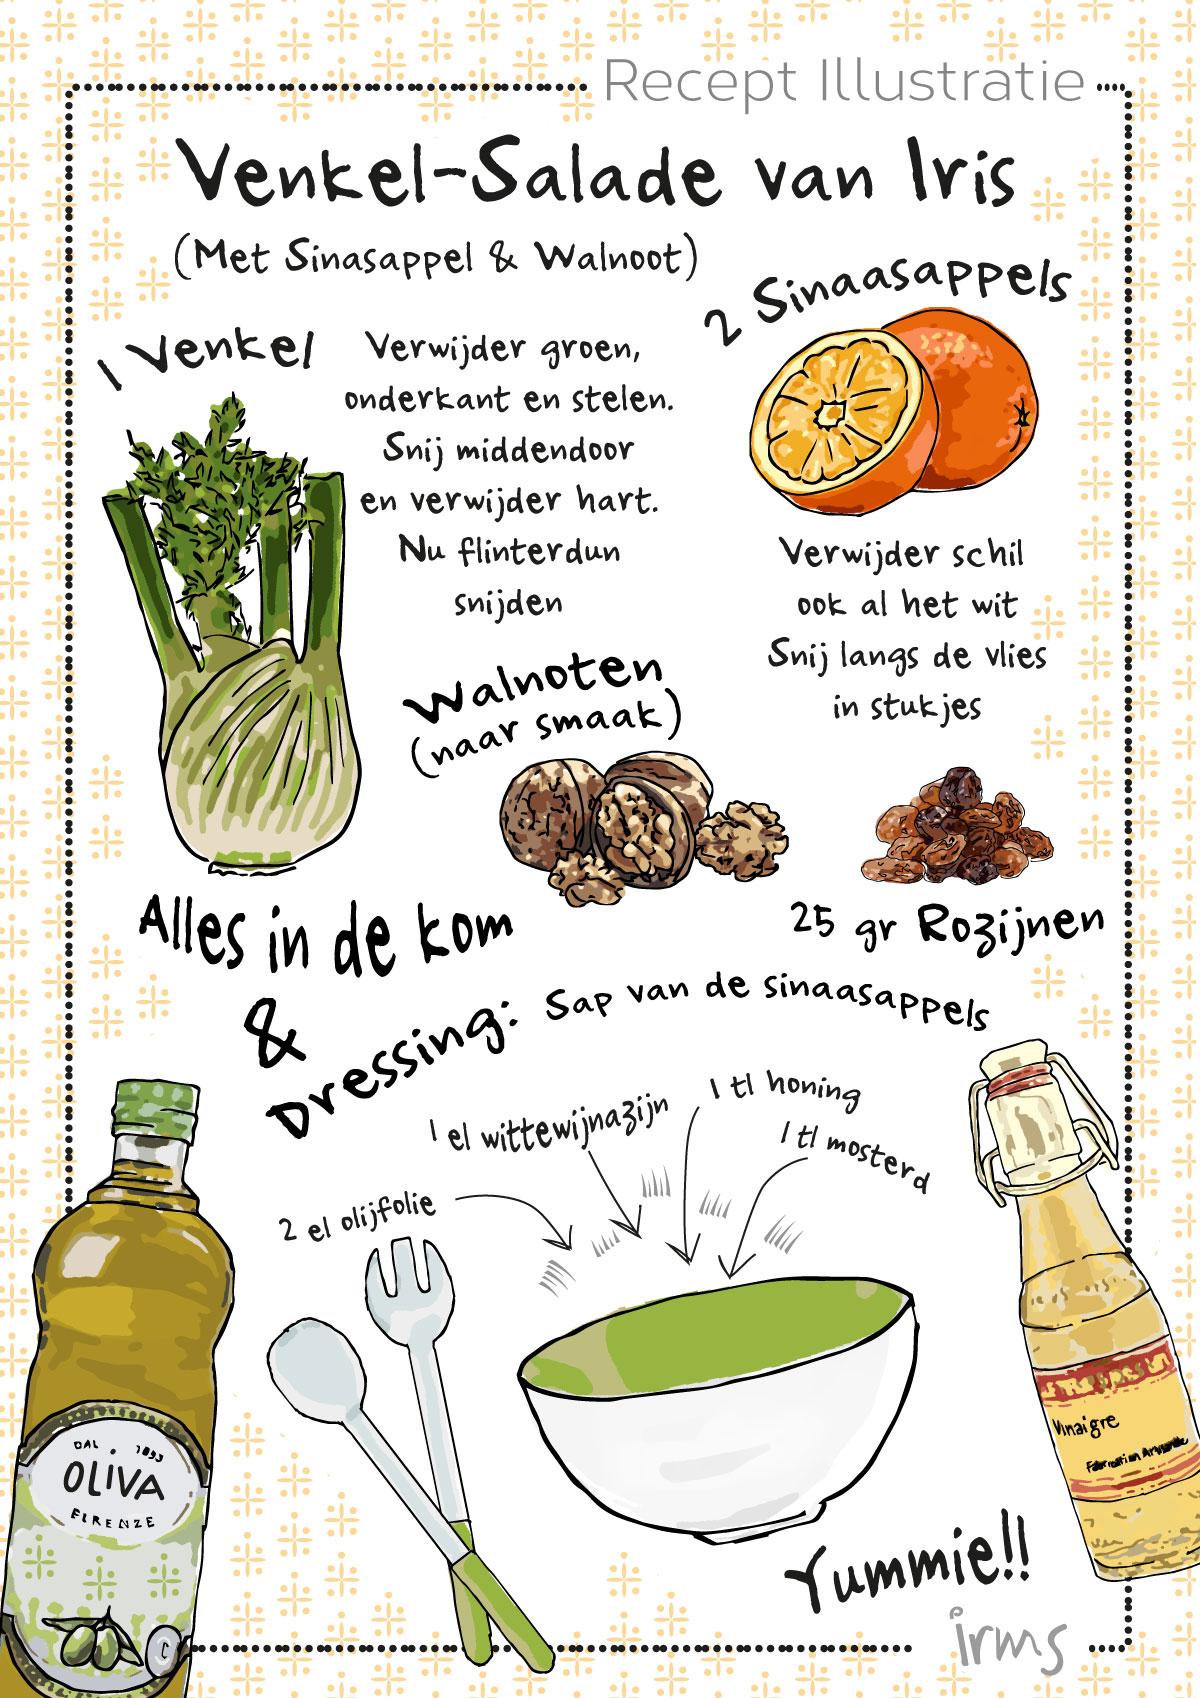 venkelsalade-recept-irmsblog